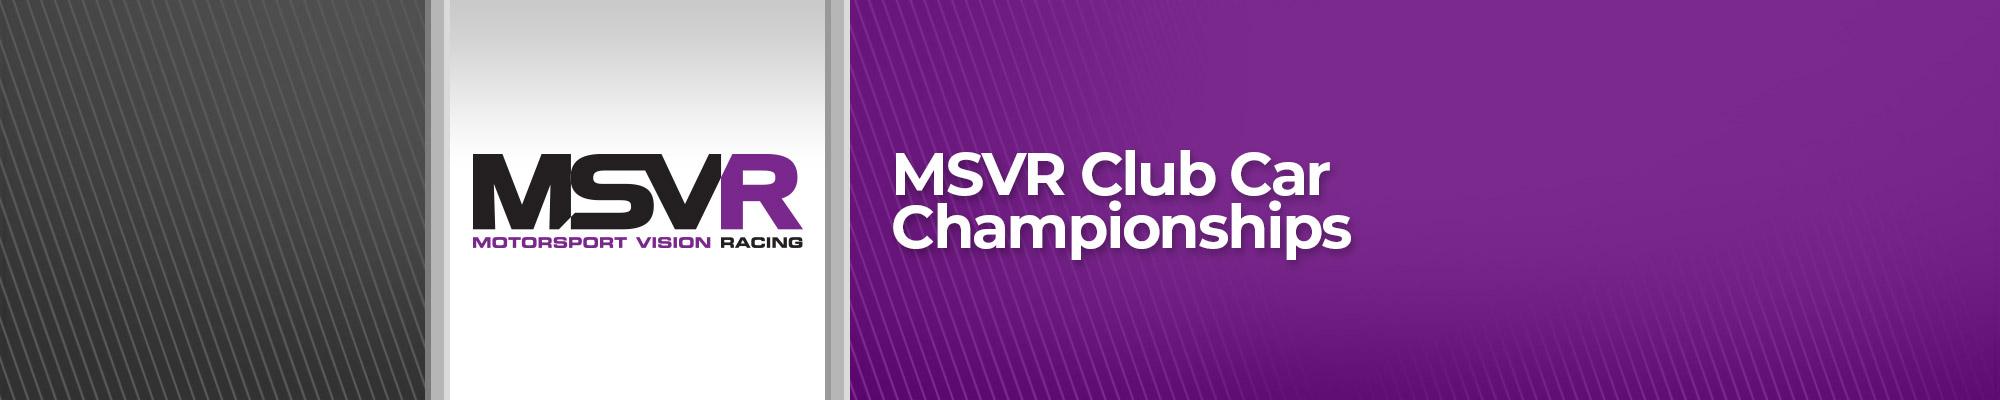 MSVR Club Car Championships - POSTPONED